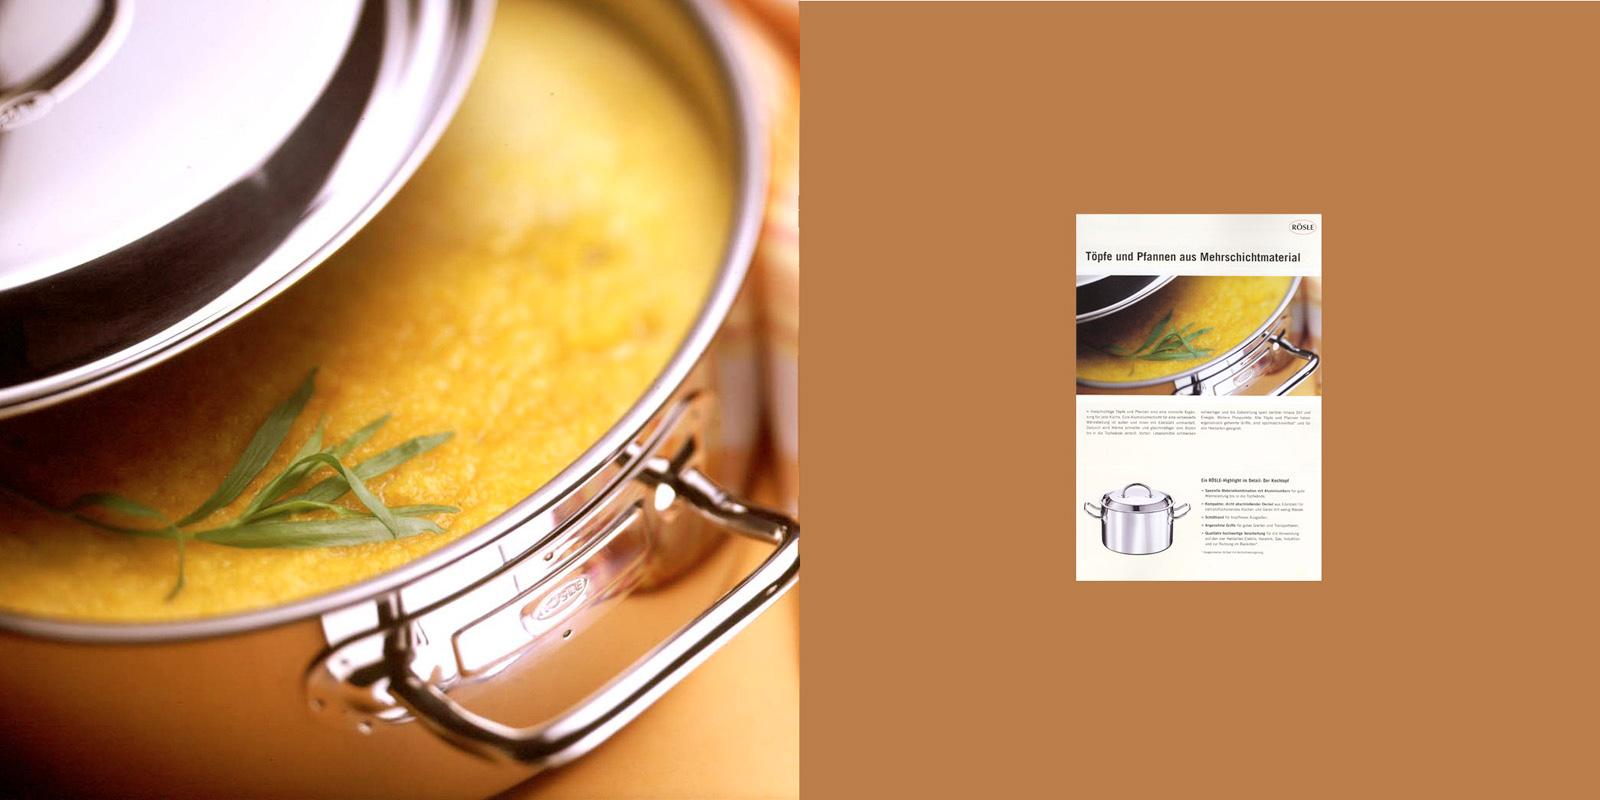 Victoria Huber Inszenierte Fotografie Stuttgart Foodfotografie Roesle Image Katalog